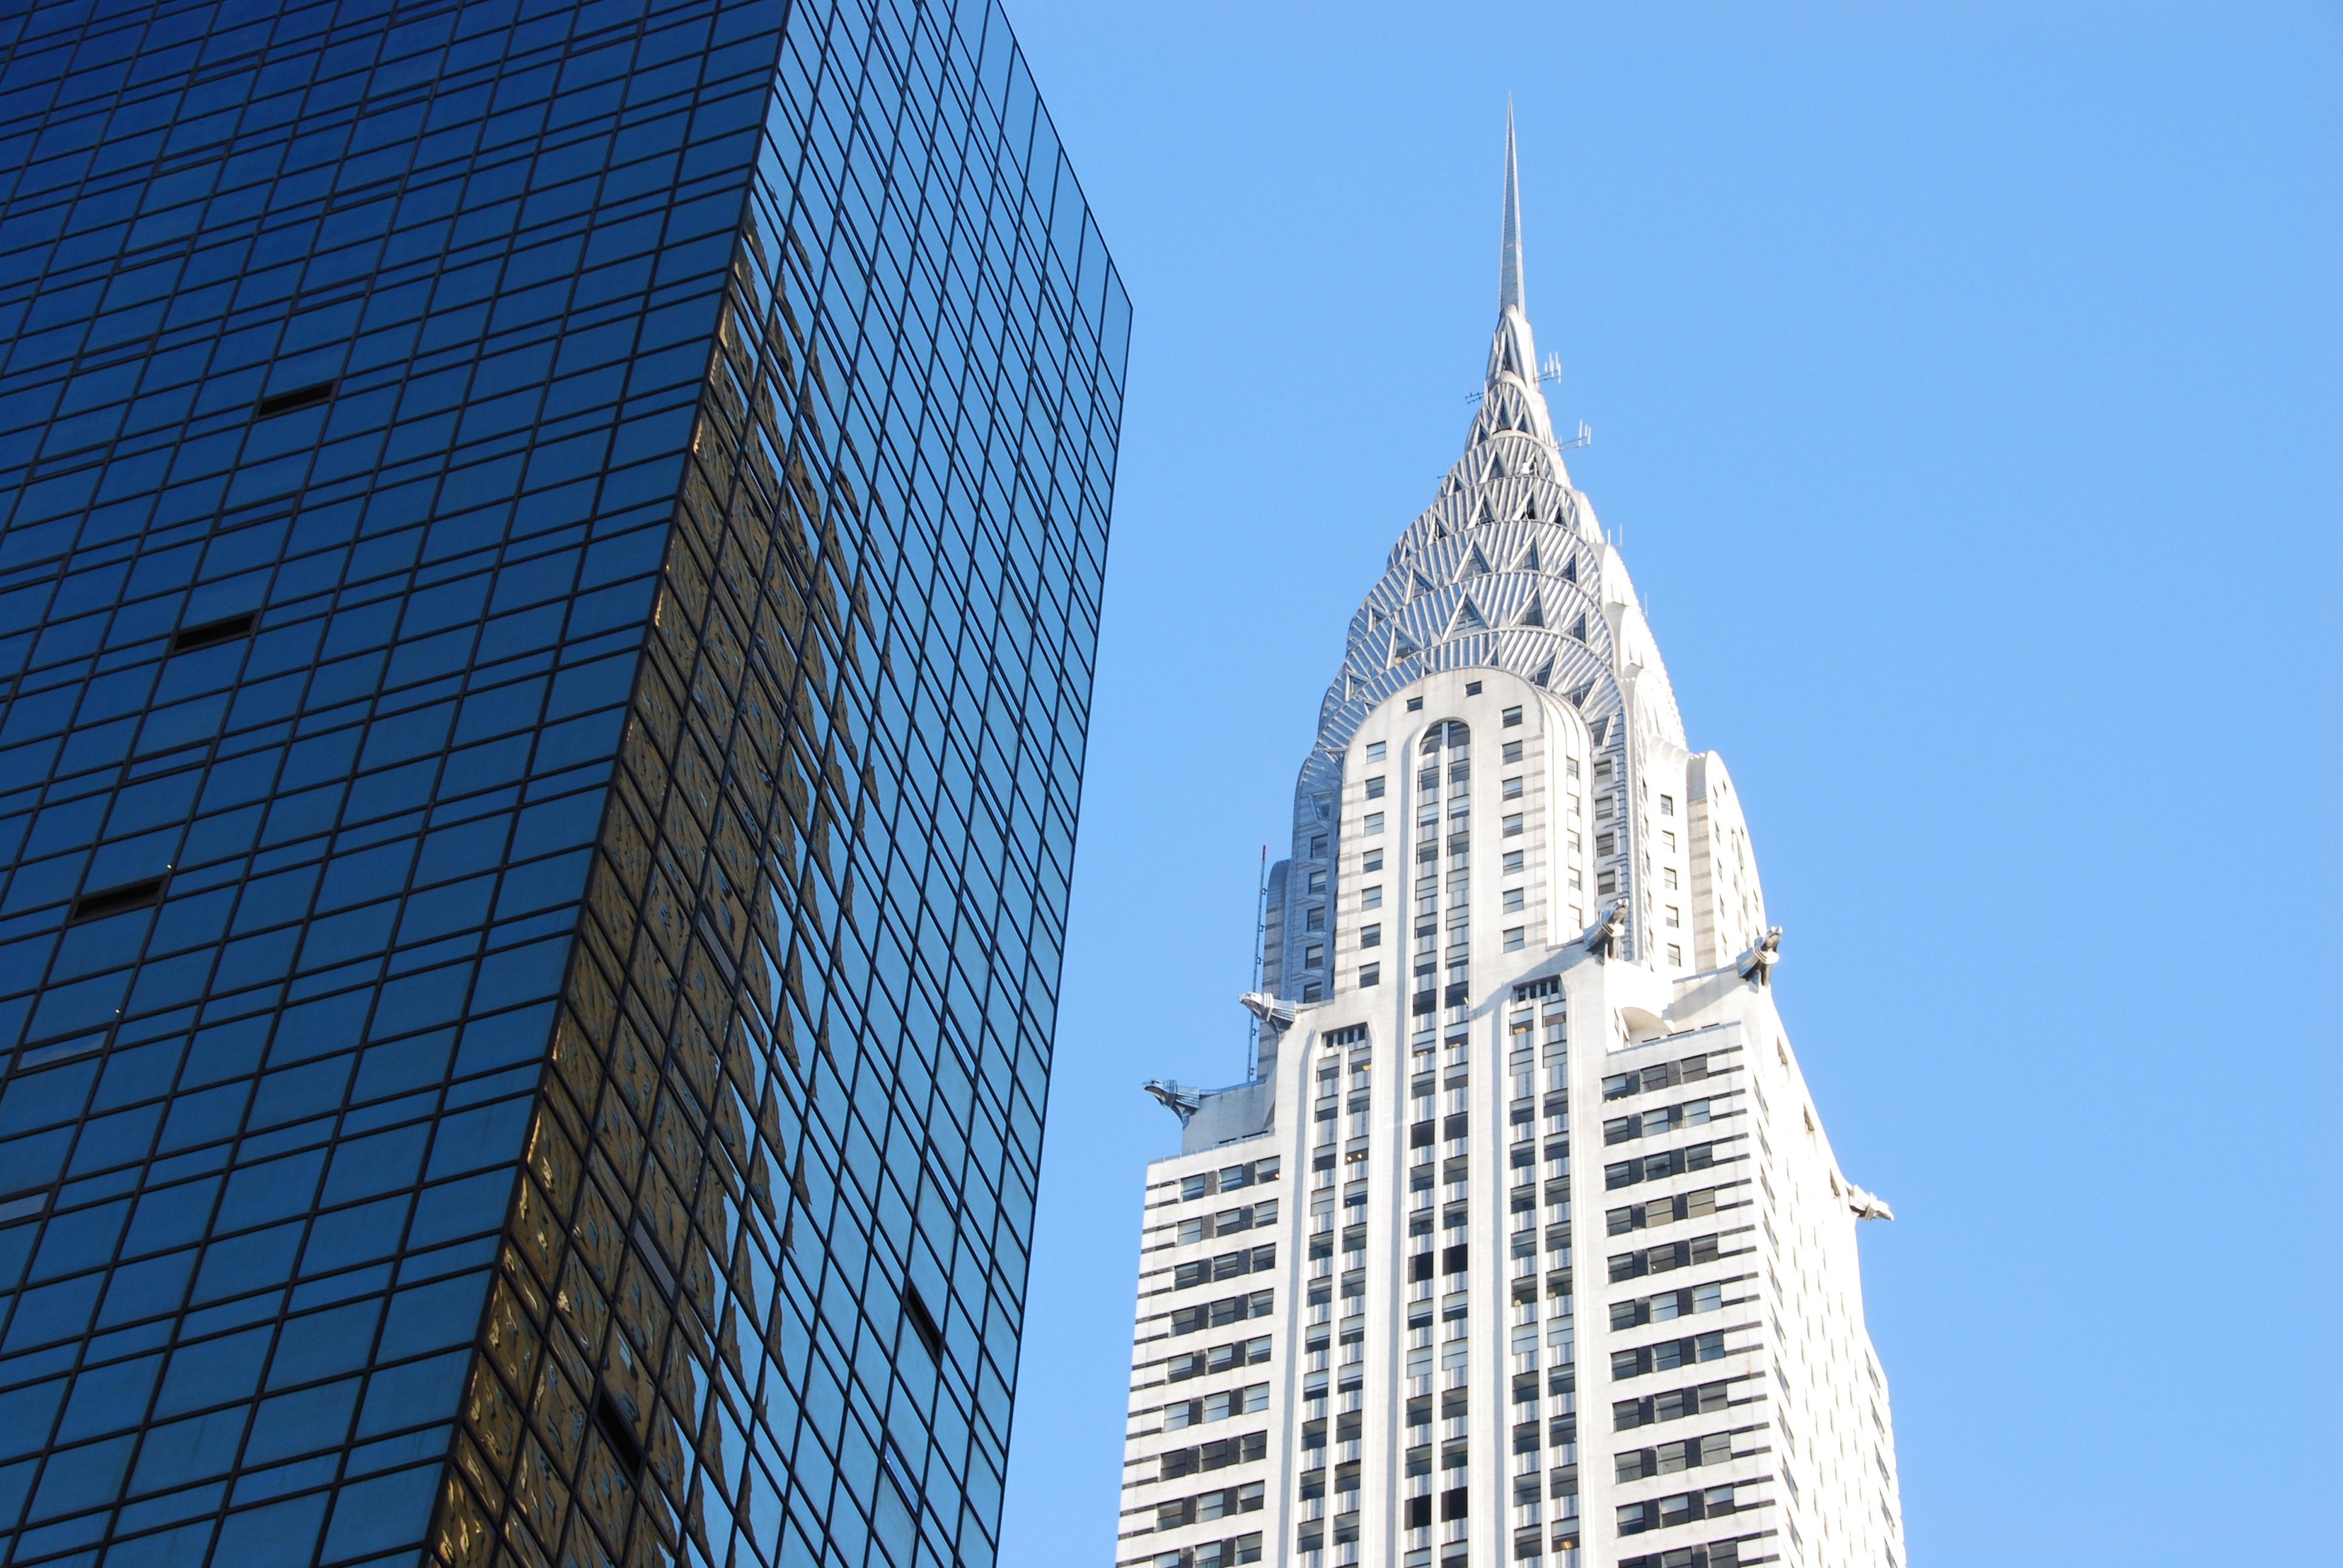 gratis afbeeldingen   architectuur  hemel  glas  gebouw  stad  wolkenkrabber  new york